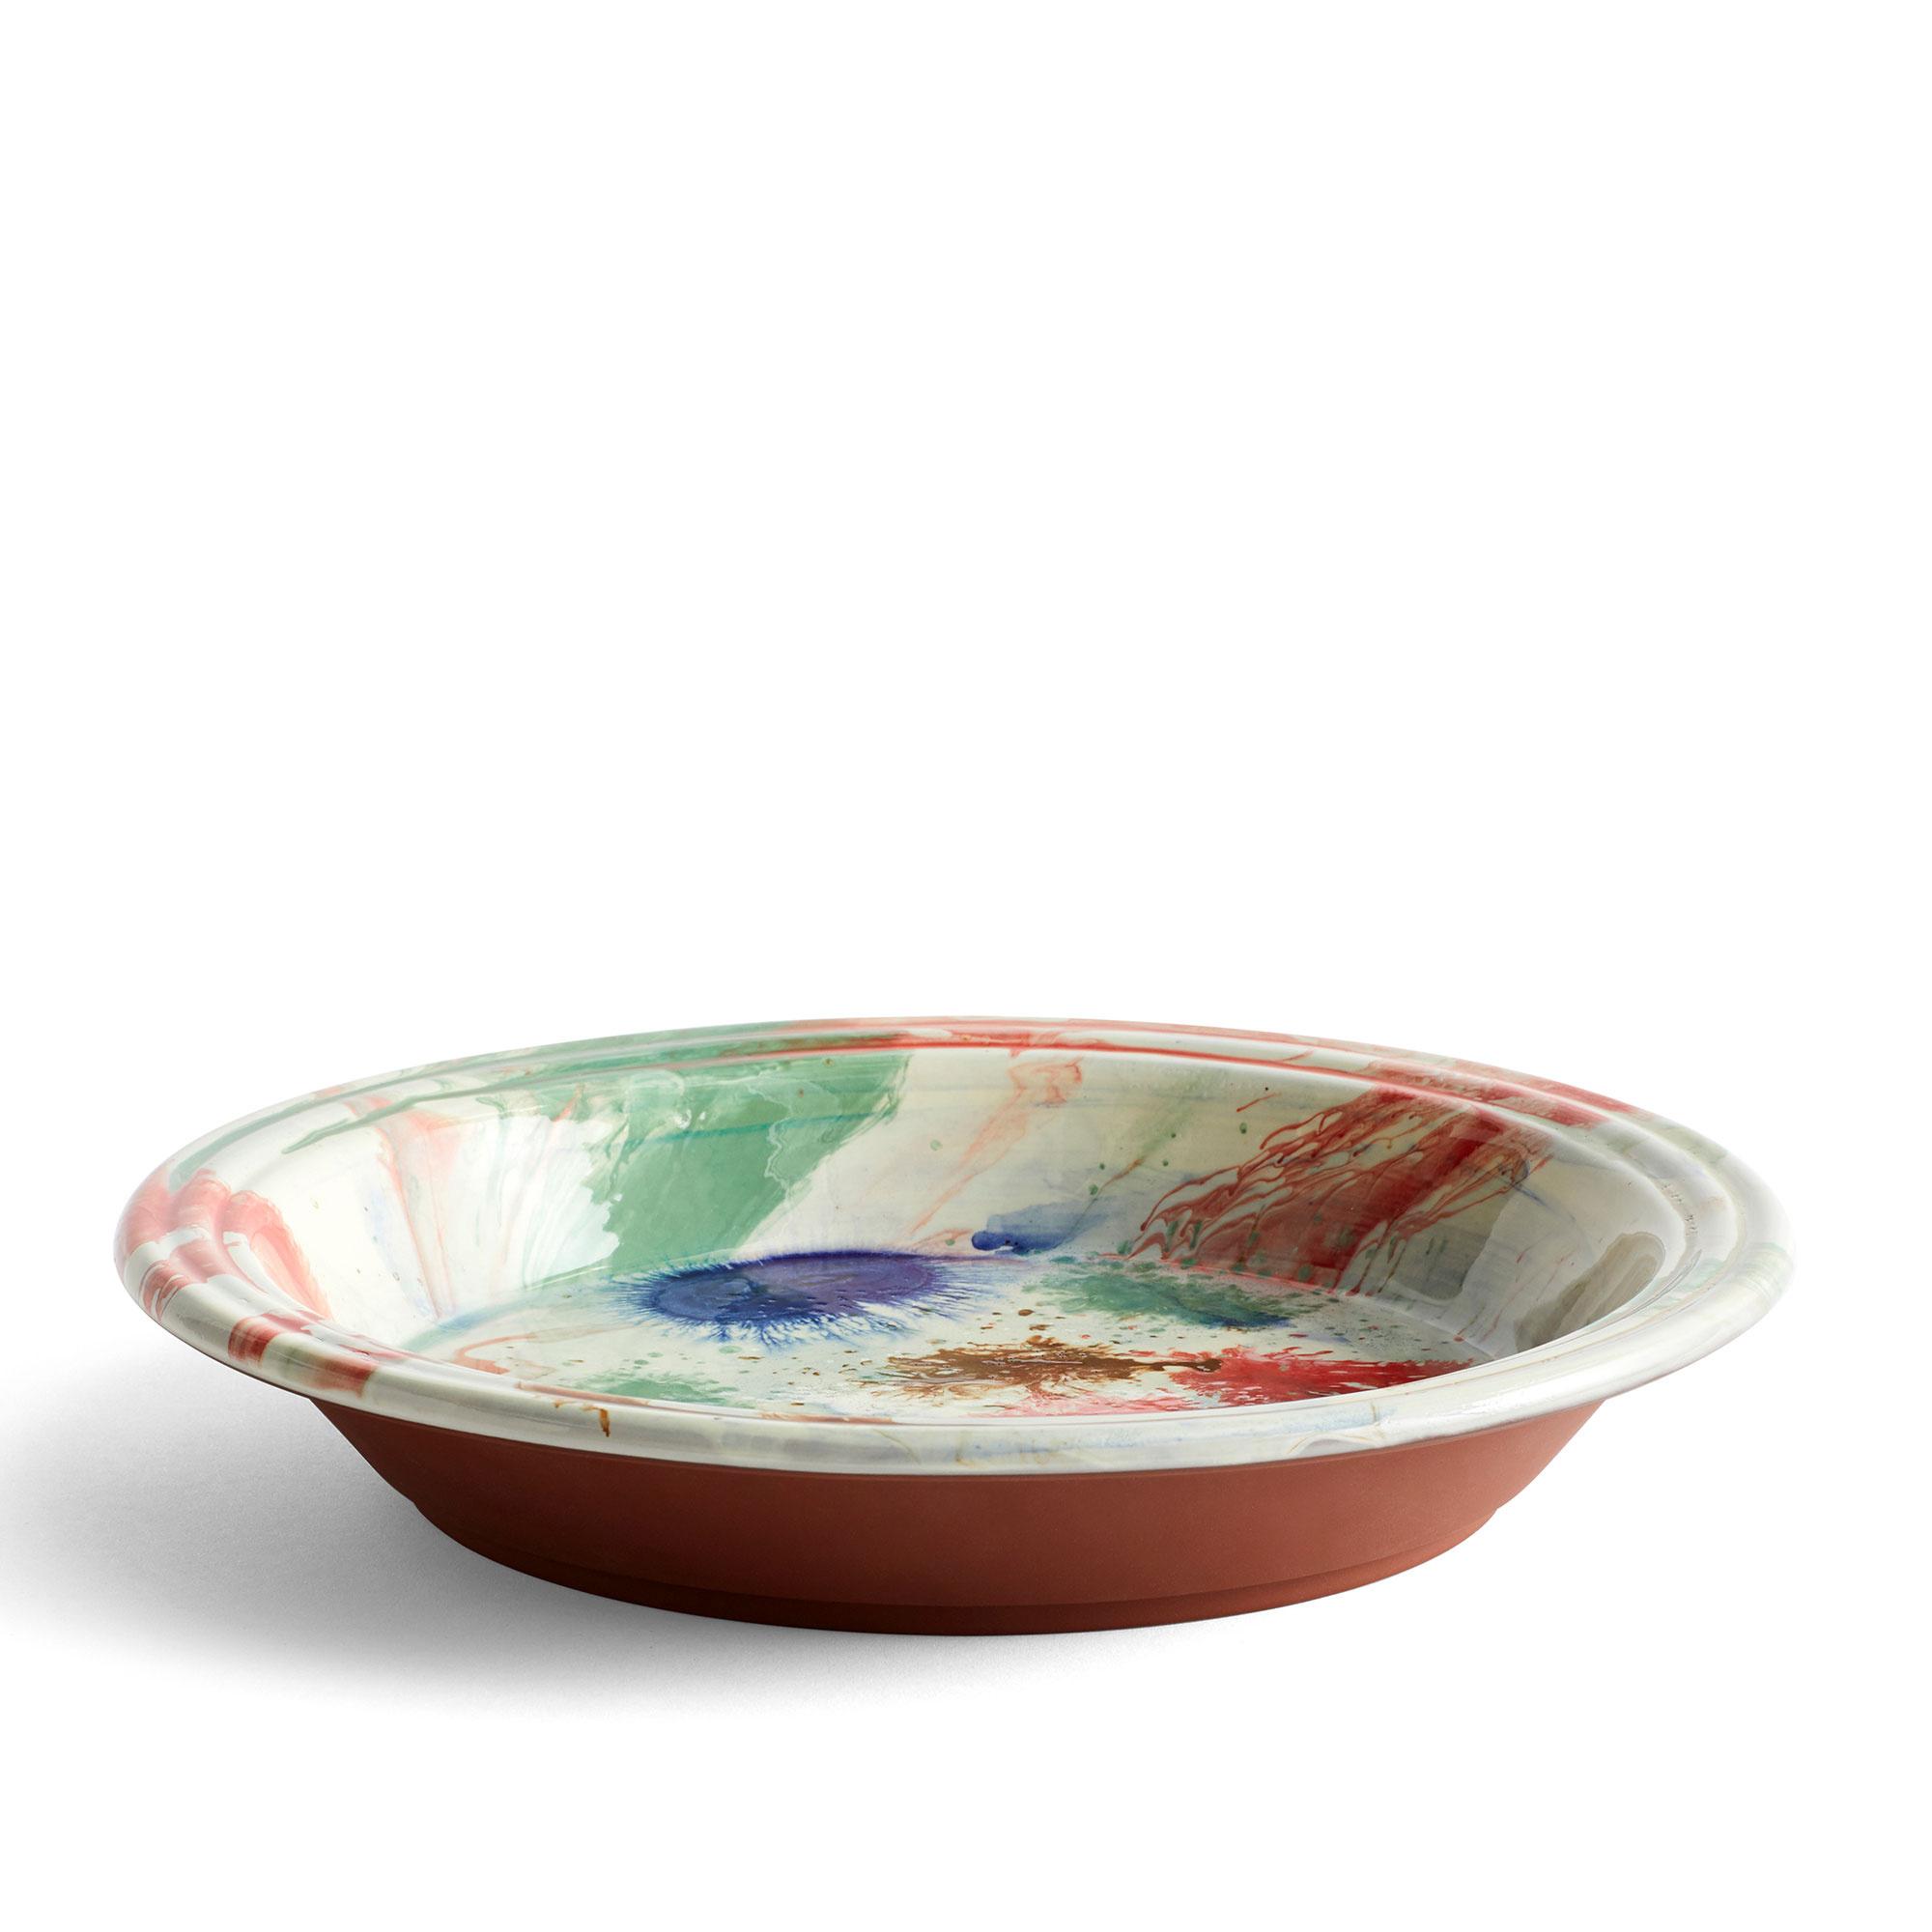 Tiny swirl bowl